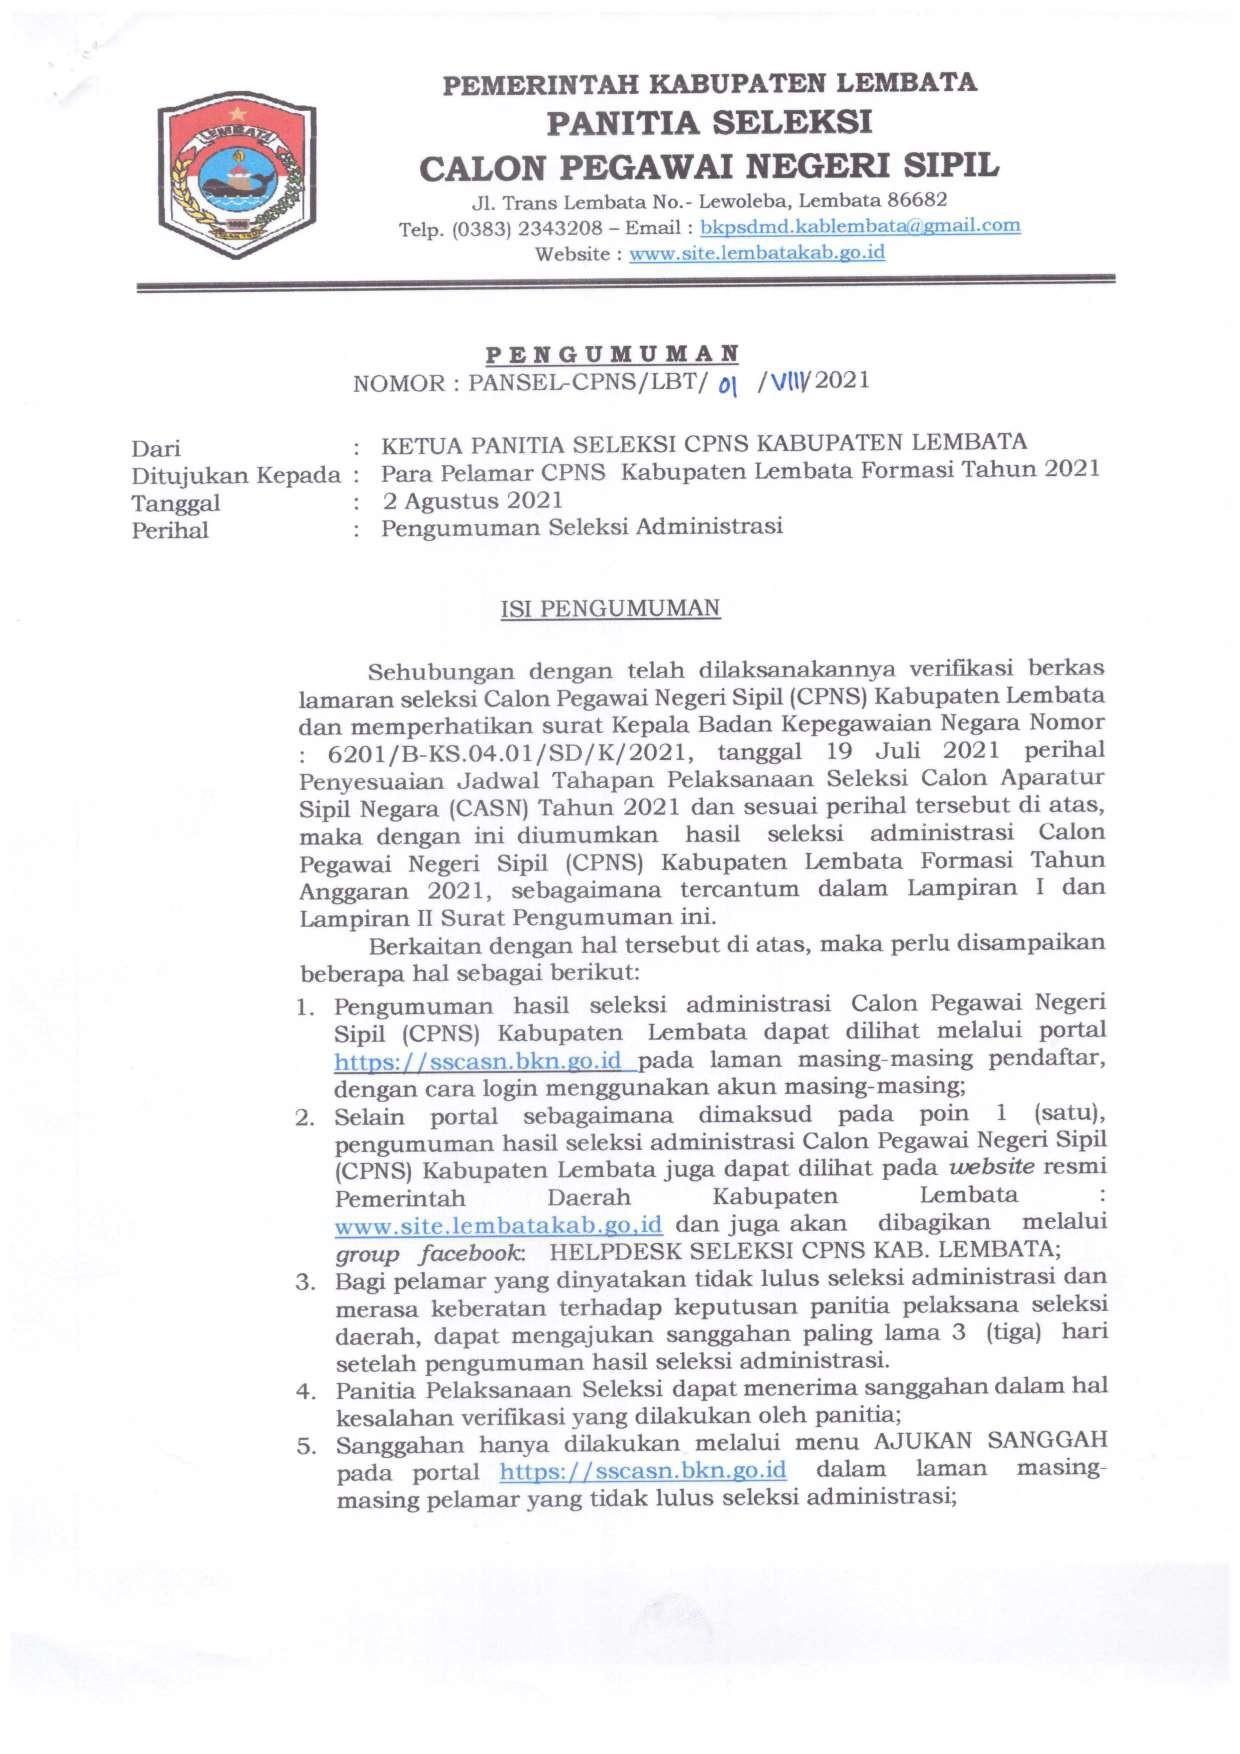 Pengumuman Seleksi Administrasi CPNS Kabupaten Lembata Tahun 2021